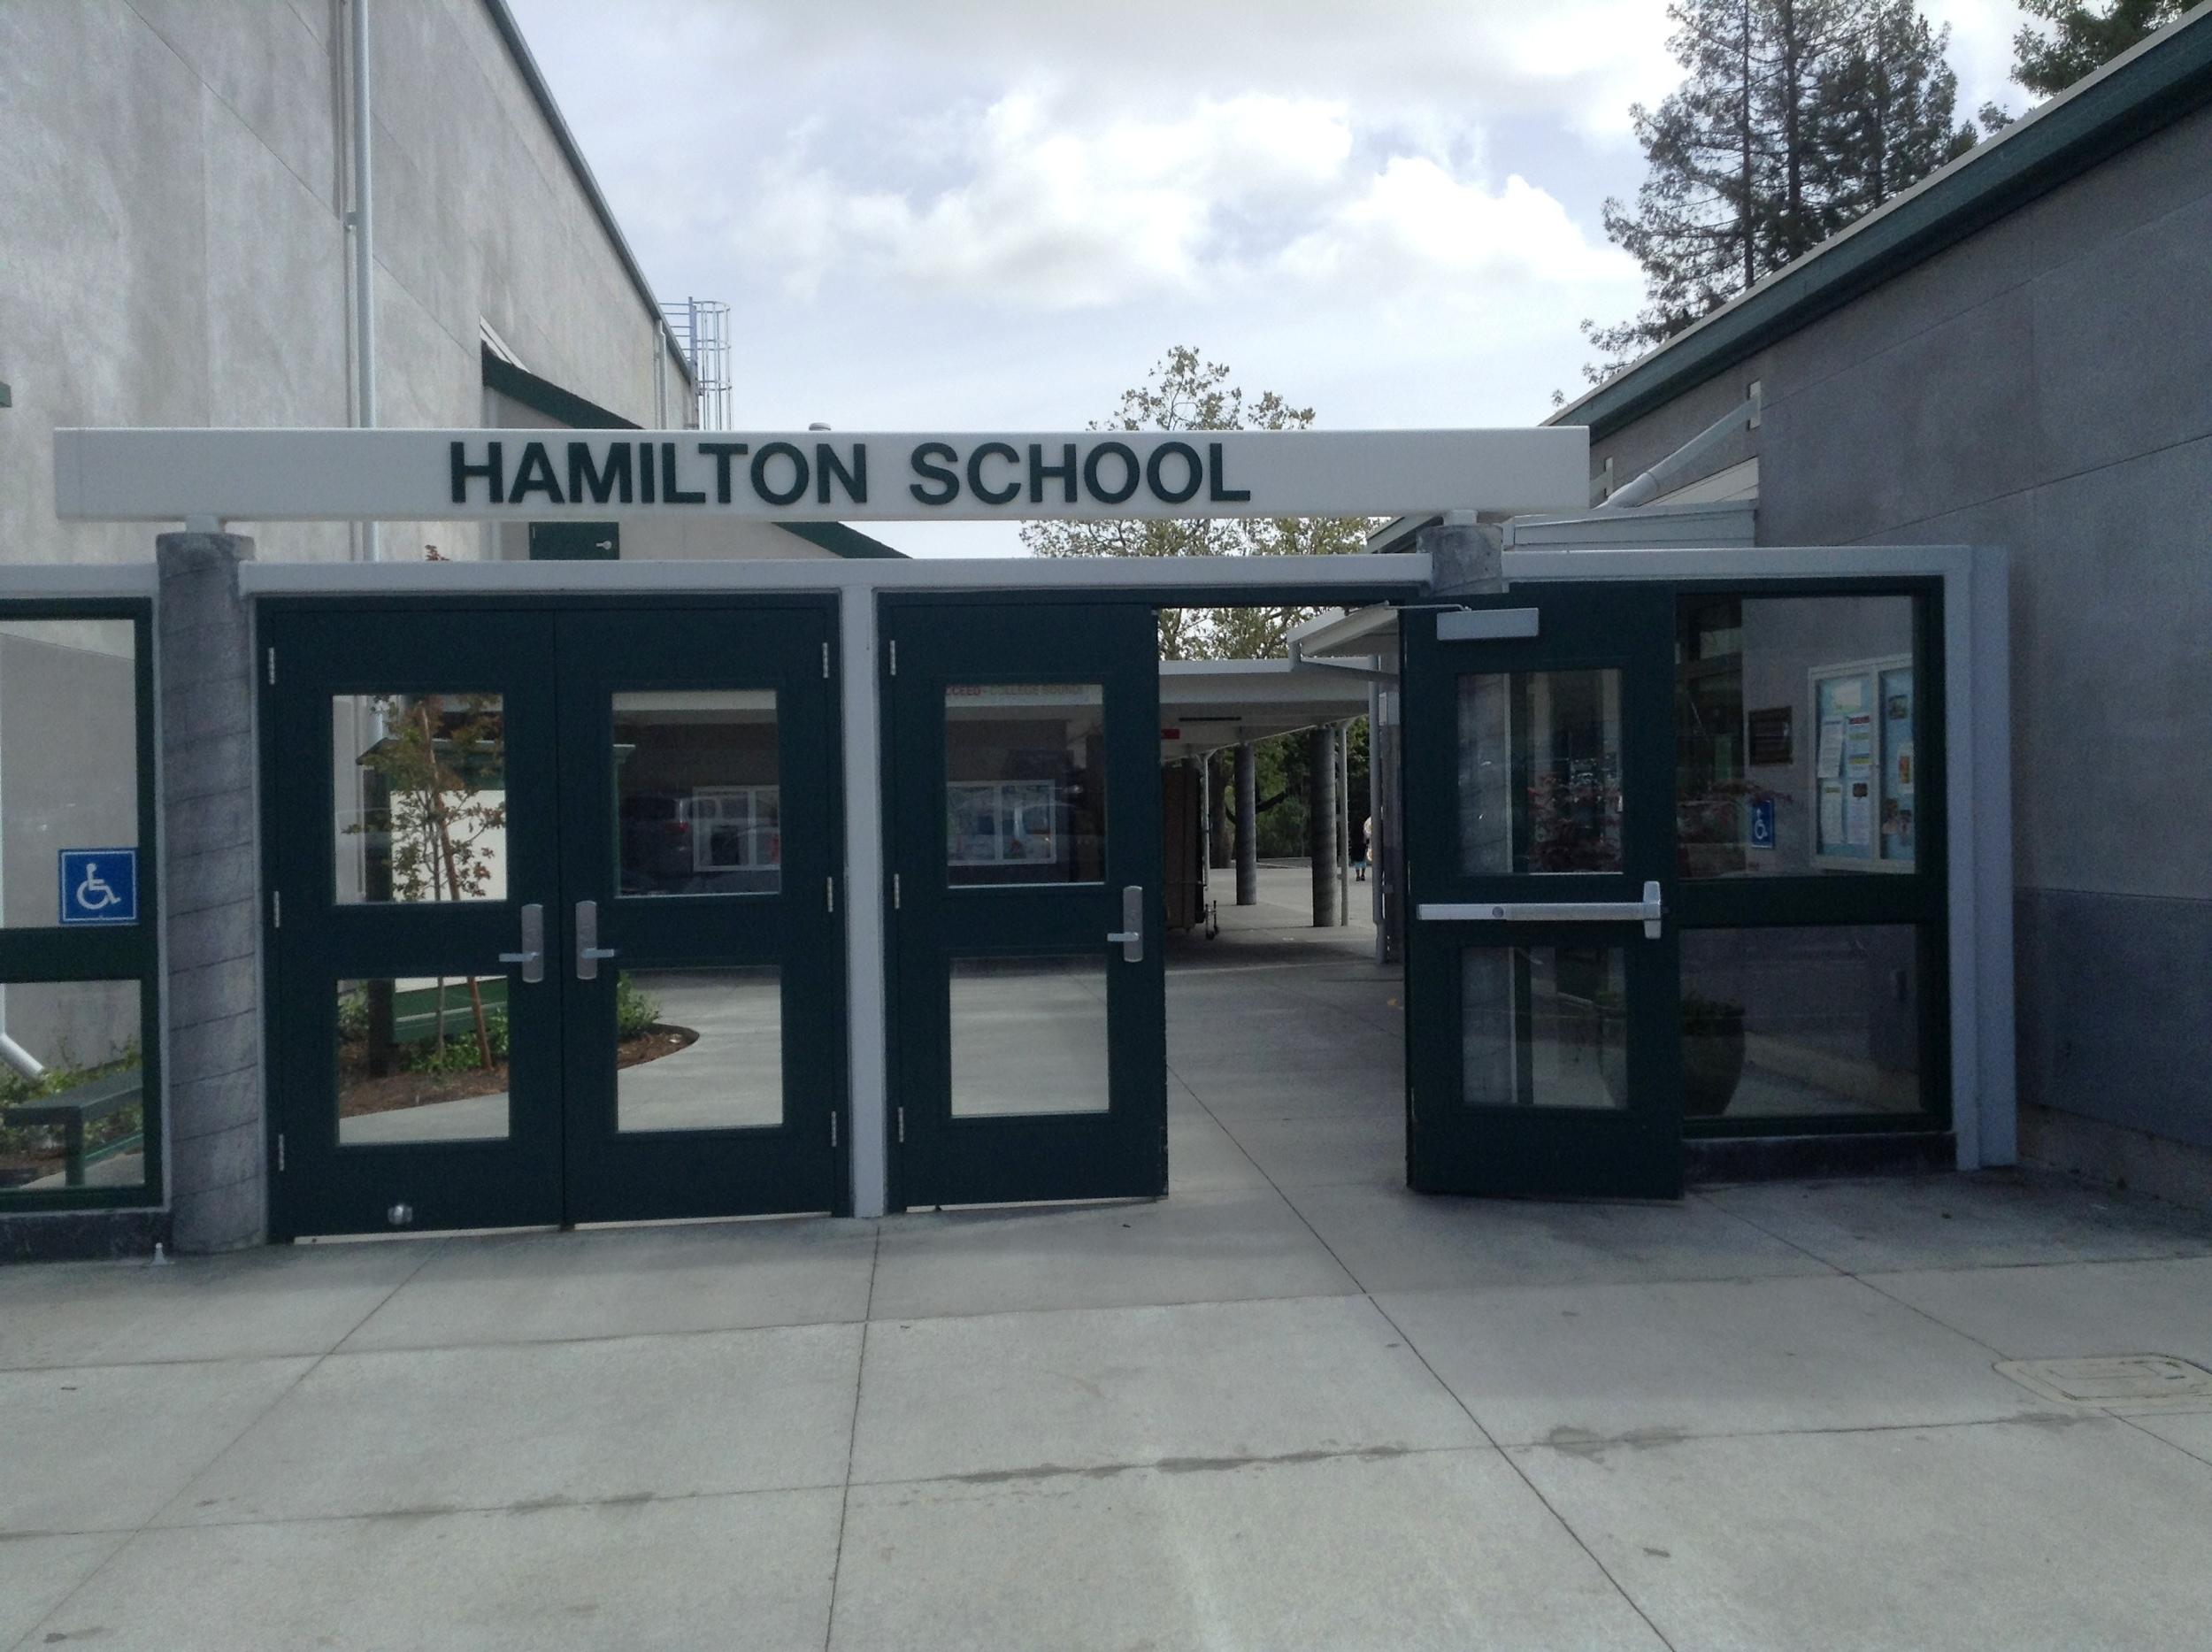 Hamilton School Front Entrance.JPG